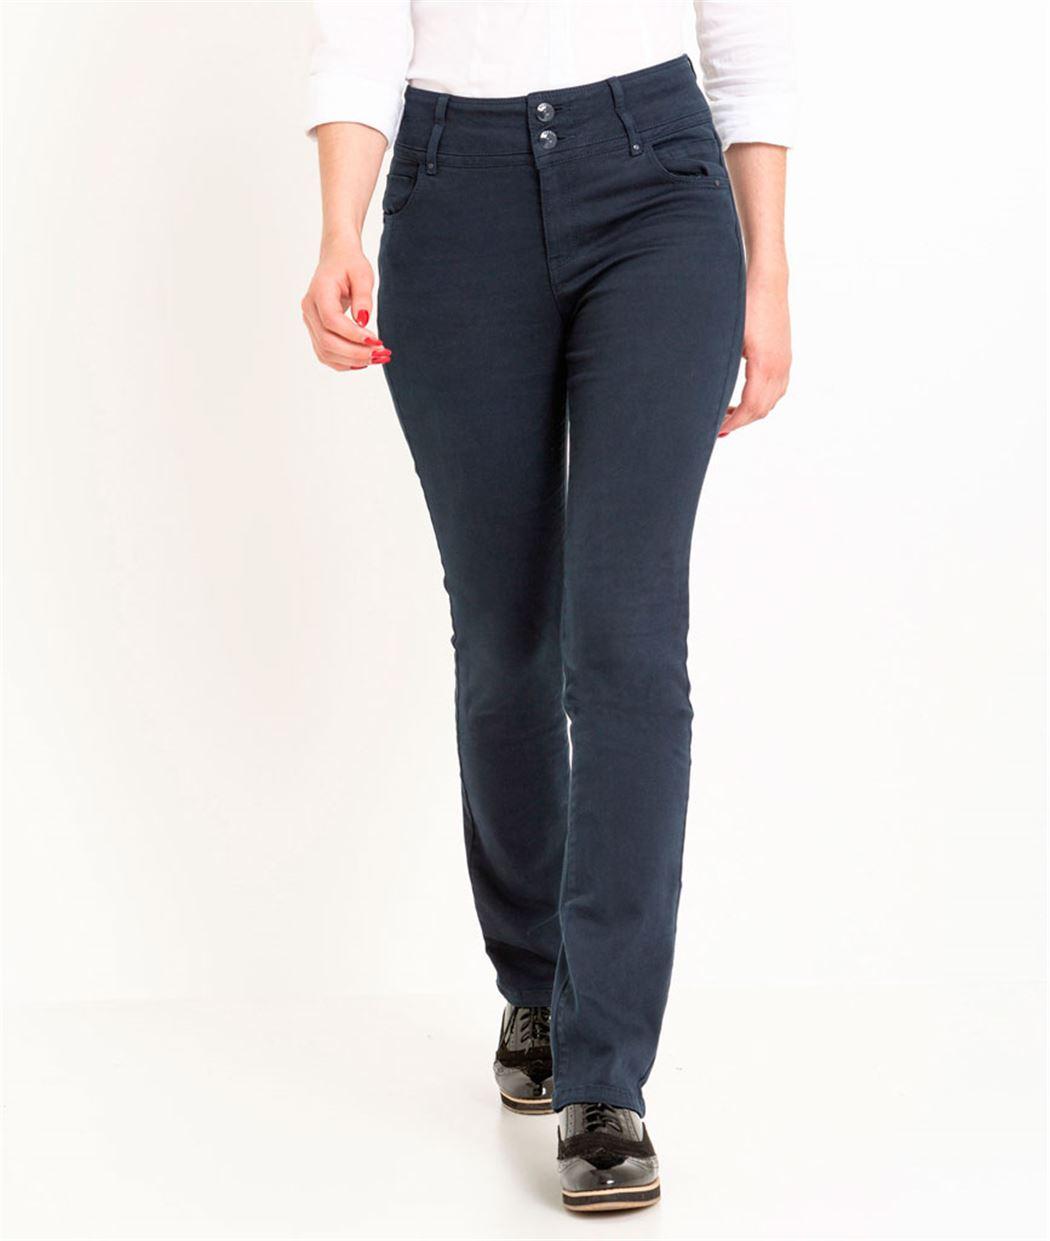 Pantalon femme droit taille haute MARINE